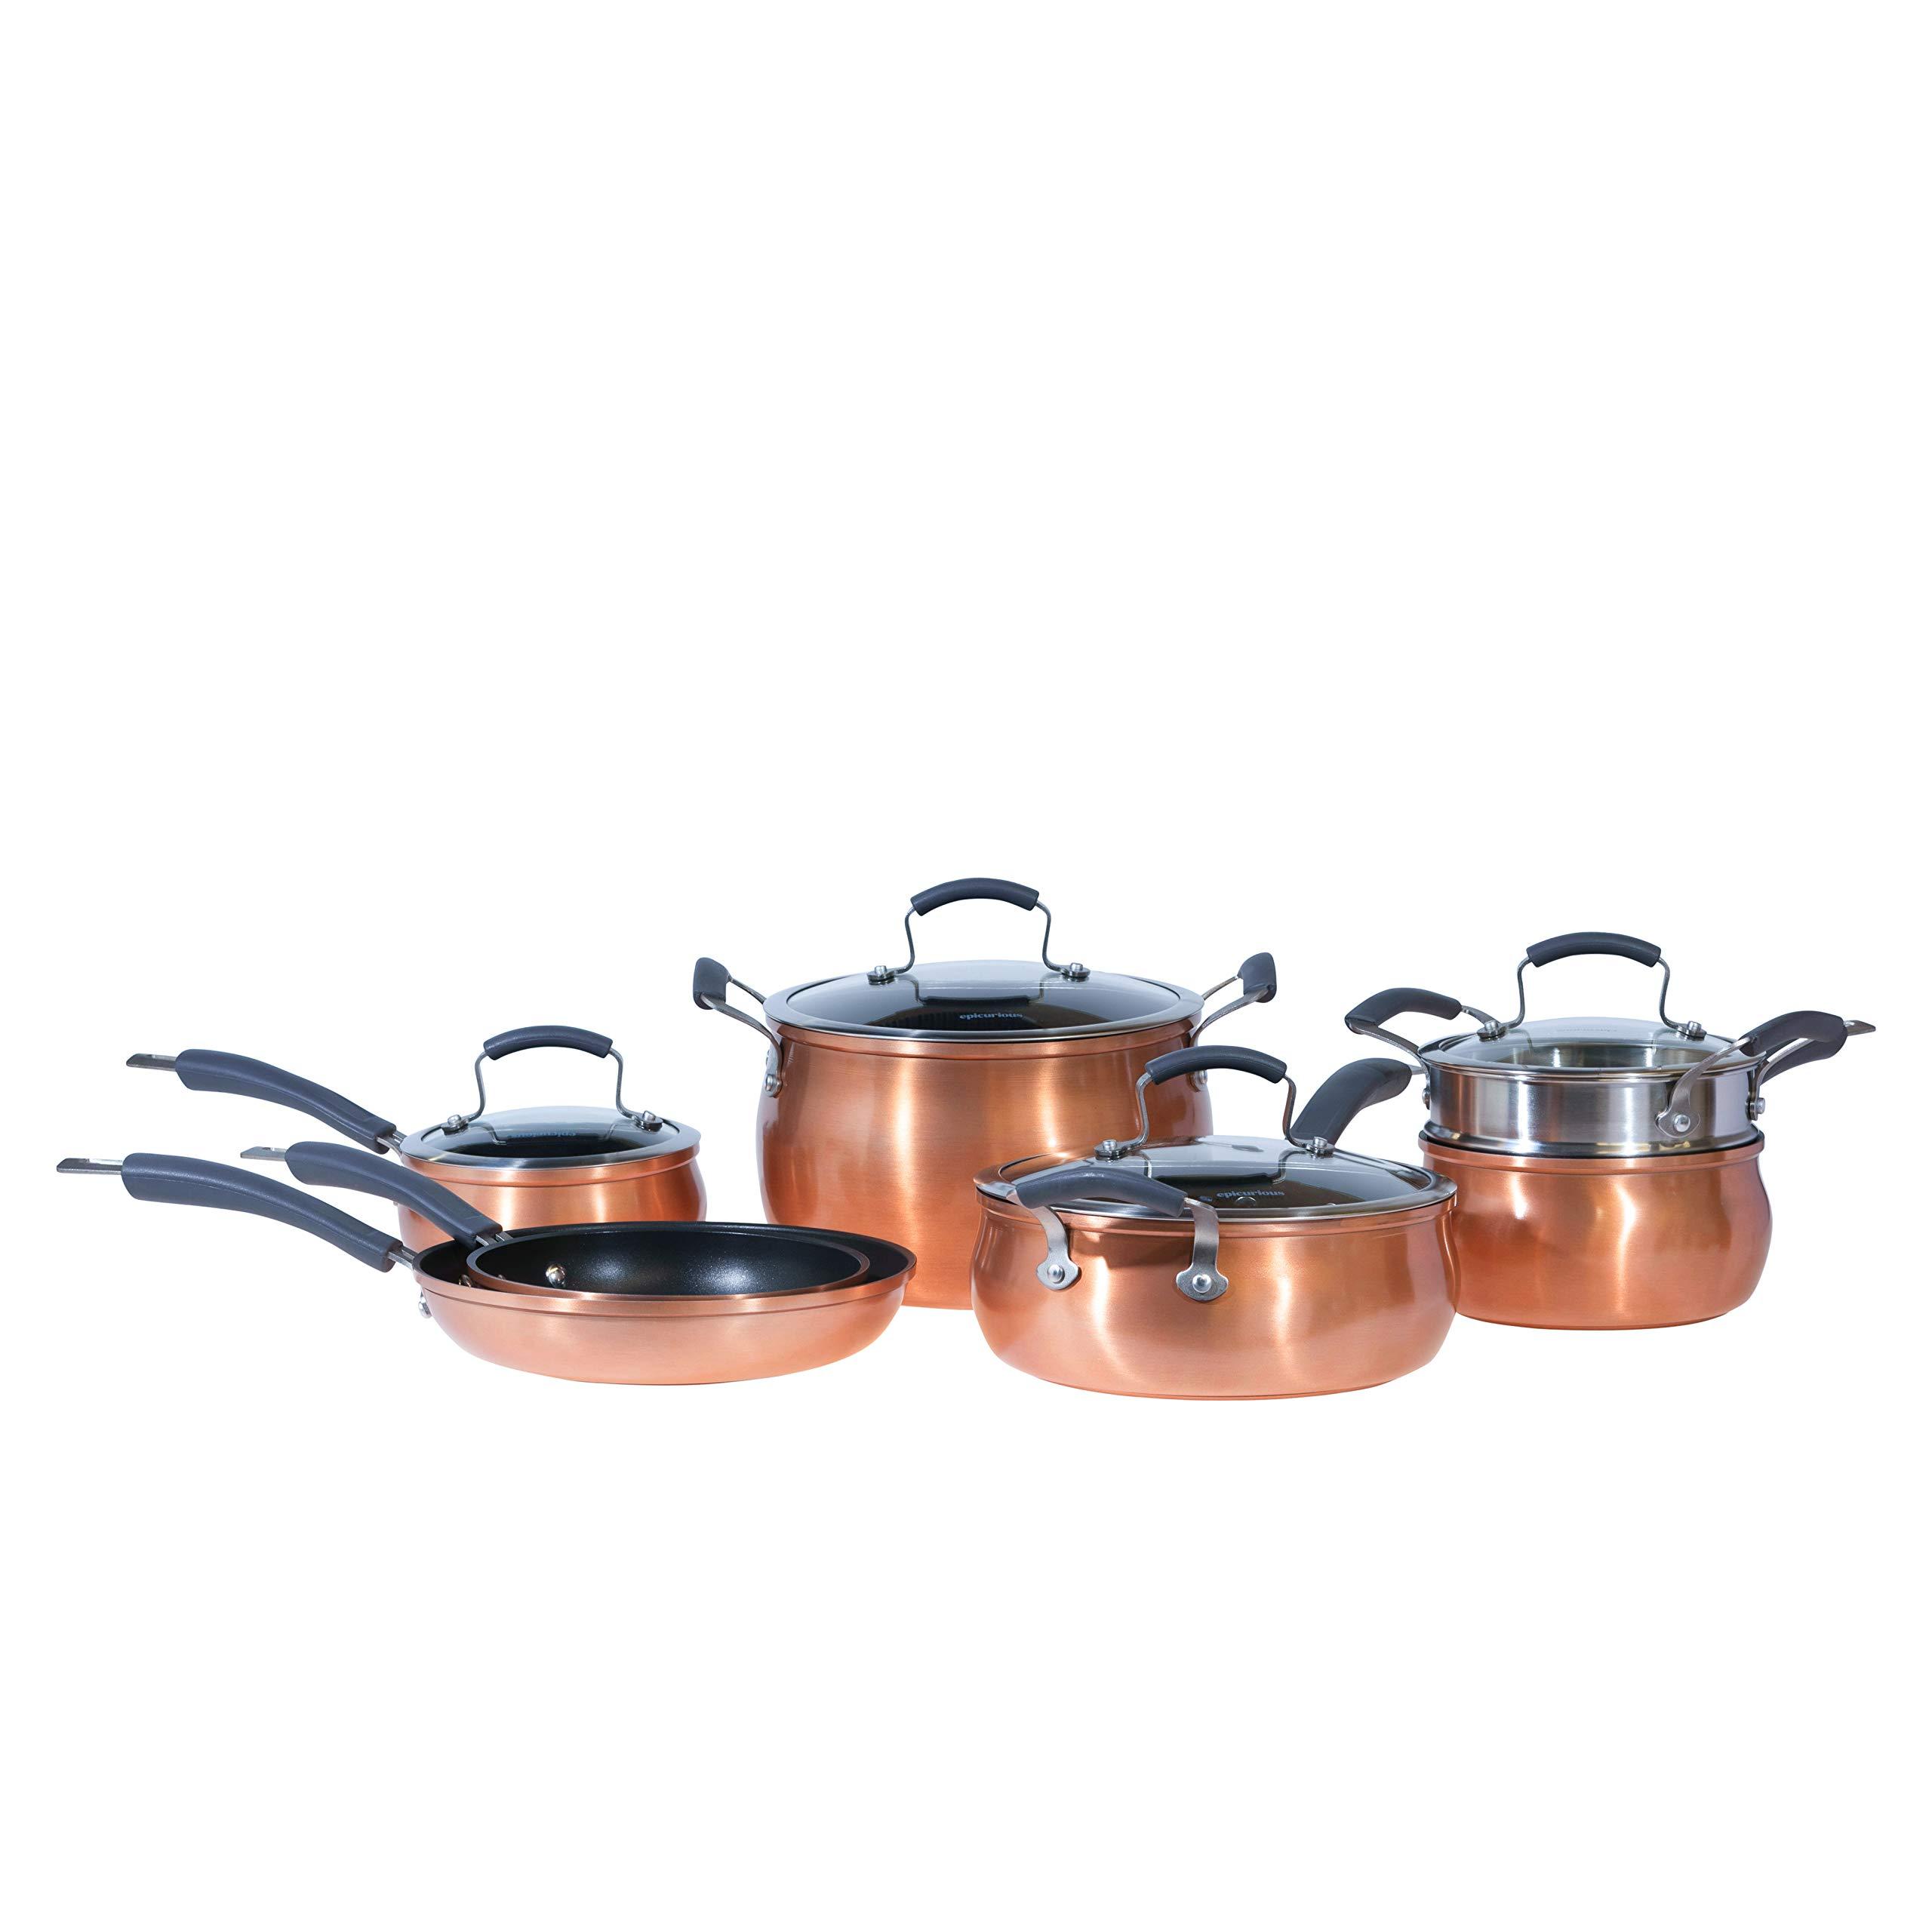 Epicurious Cookware Collection- Dishwasher Safe Oven Safe, Nonstick Aluminum 11 Piece Copper Cookware Set by Epicurious